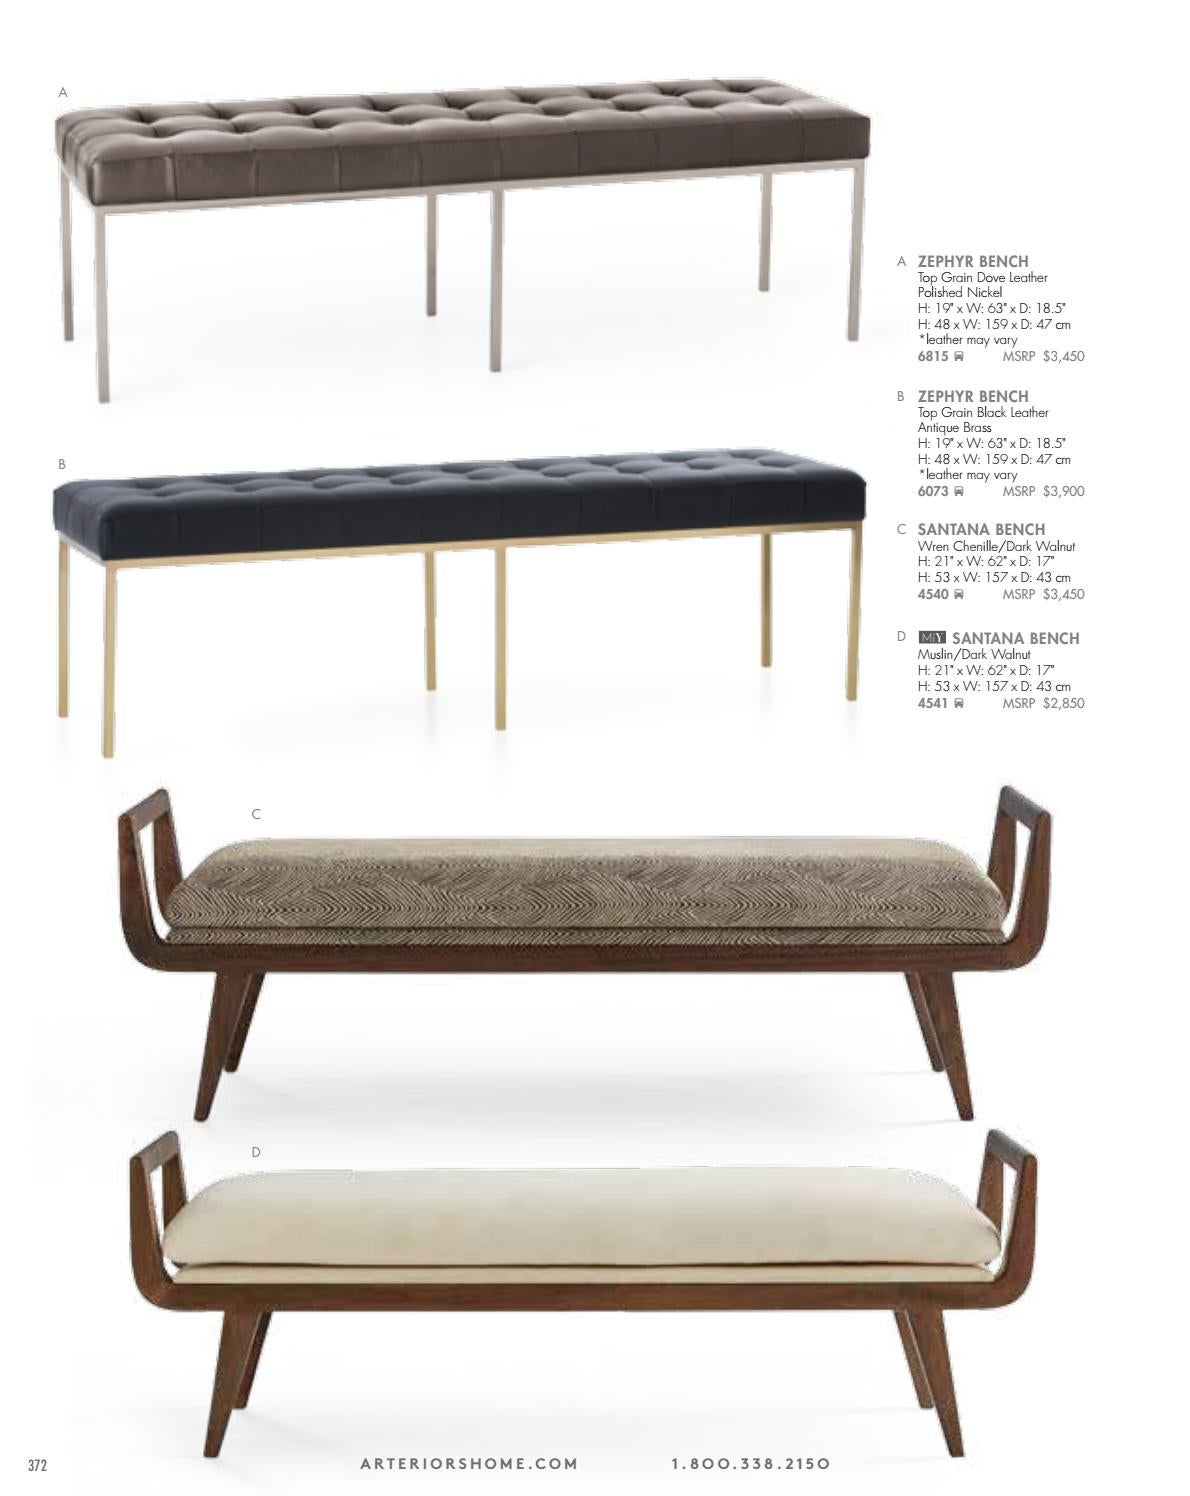 Phenomenal Arteriors 2018 Catalog By Arteriors Issuu Machost Co Dining Chair Design Ideas Machostcouk